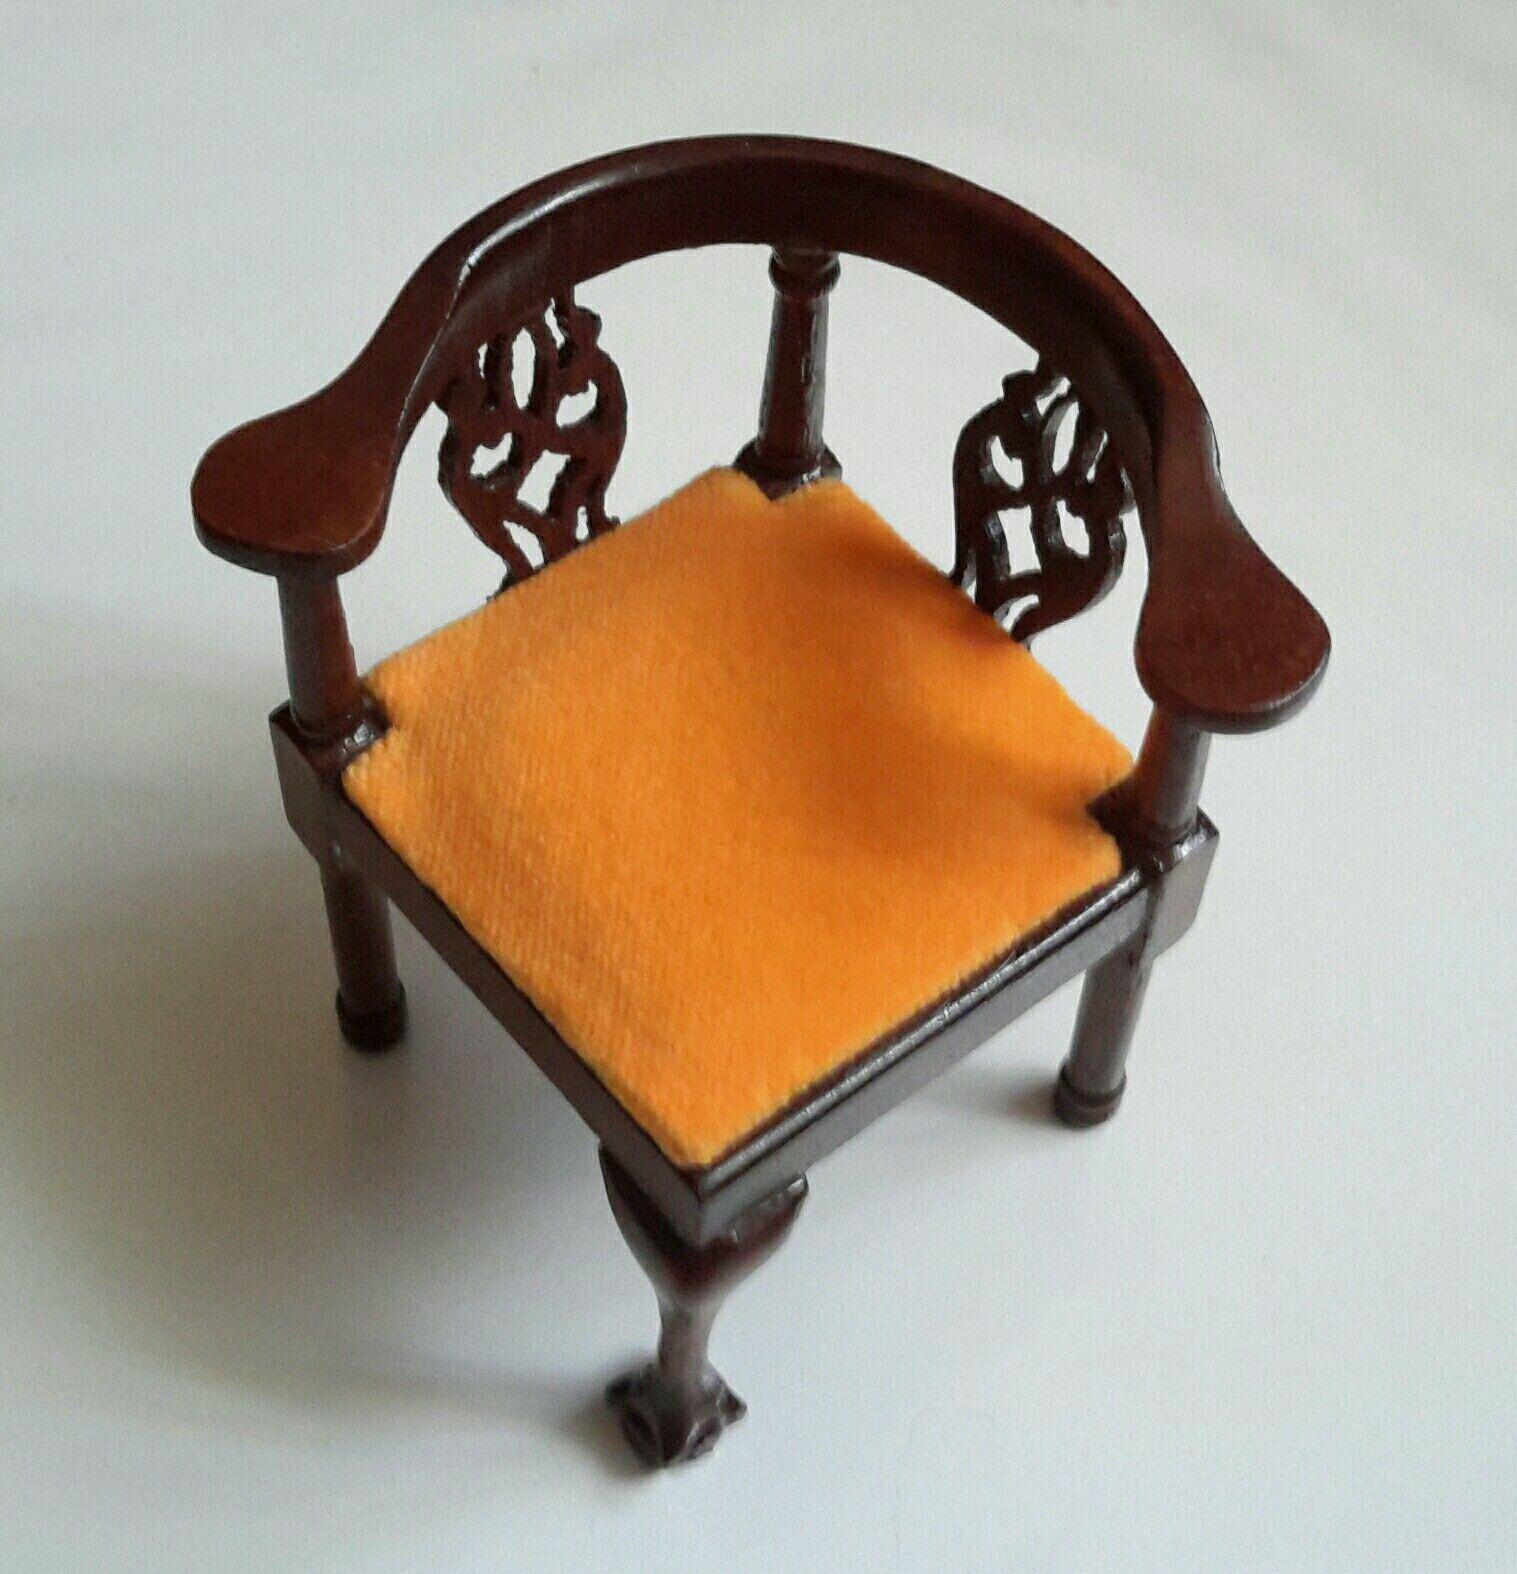 moda Nuevo Vintage Muñecas en Miniatura Queen Queen Queen Anne esquina silla de terciopelo de oro por fantástico  garantía de crédito